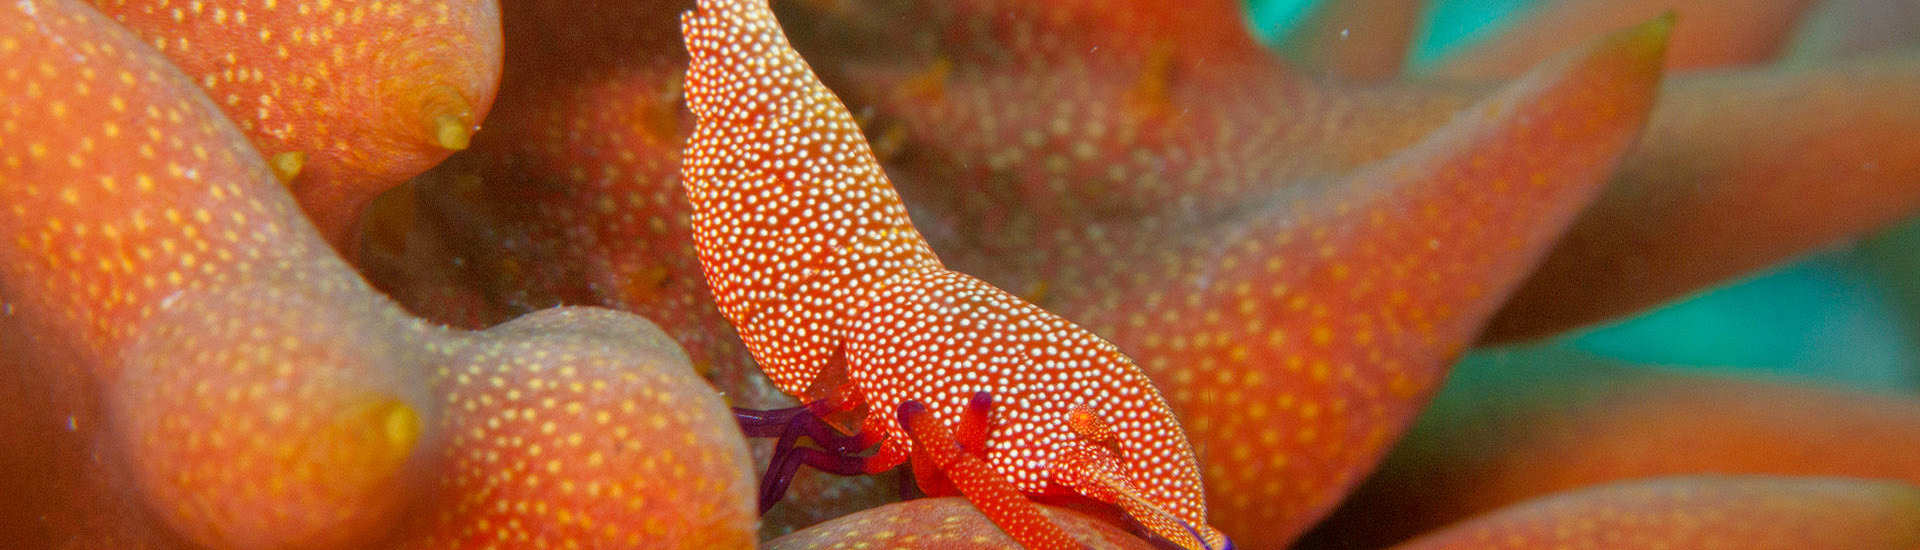 Imperator Garnele (emperor shrimp) – Halmahera, Indonesien